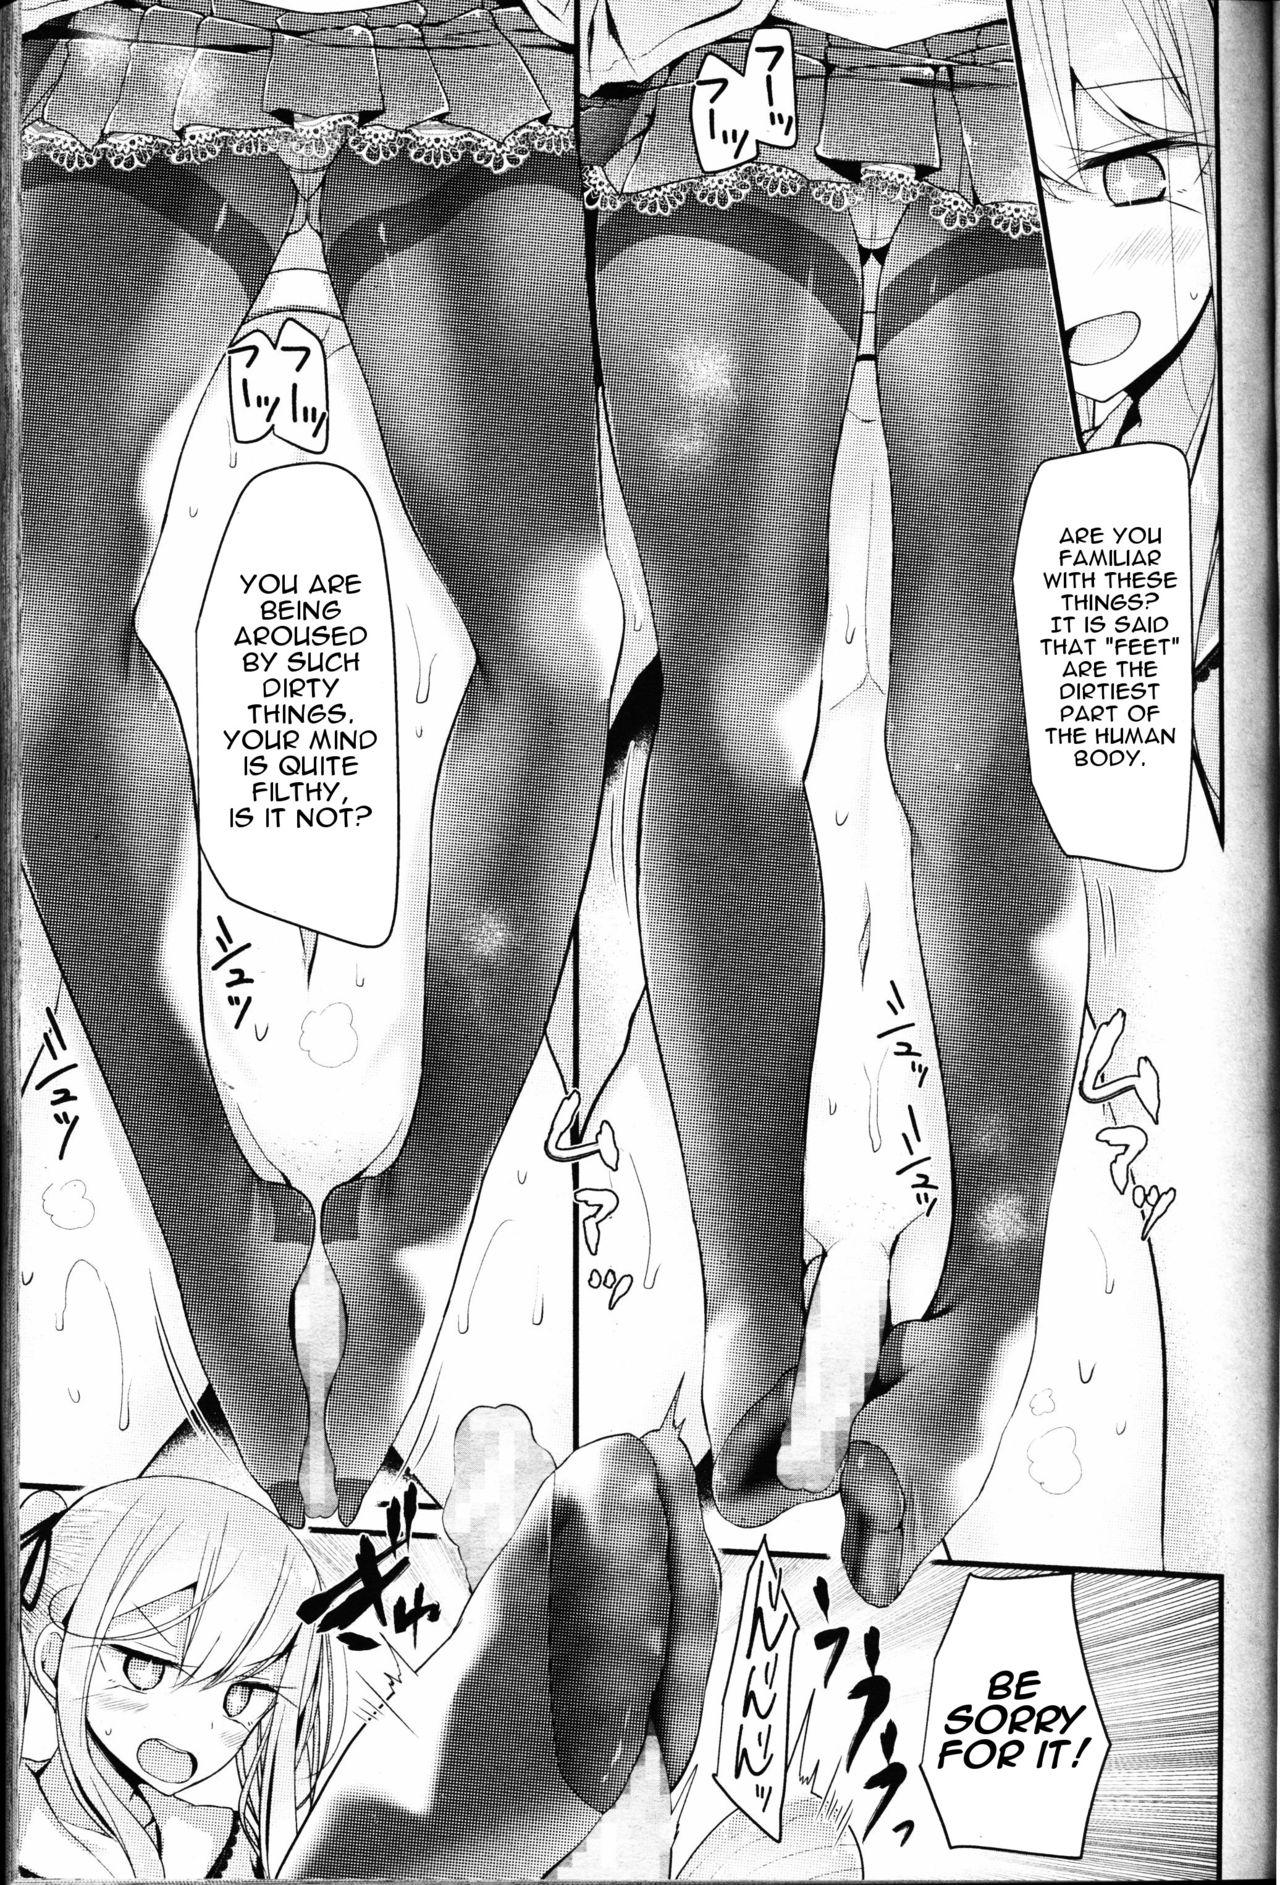 [Oouso] Pet or Slave - Yamada Rafflesia no Baai | Pet or Slave - The Case of Rafflesia Yamada (Girls forM Vol. 12) [English] [sneikkimies] 10